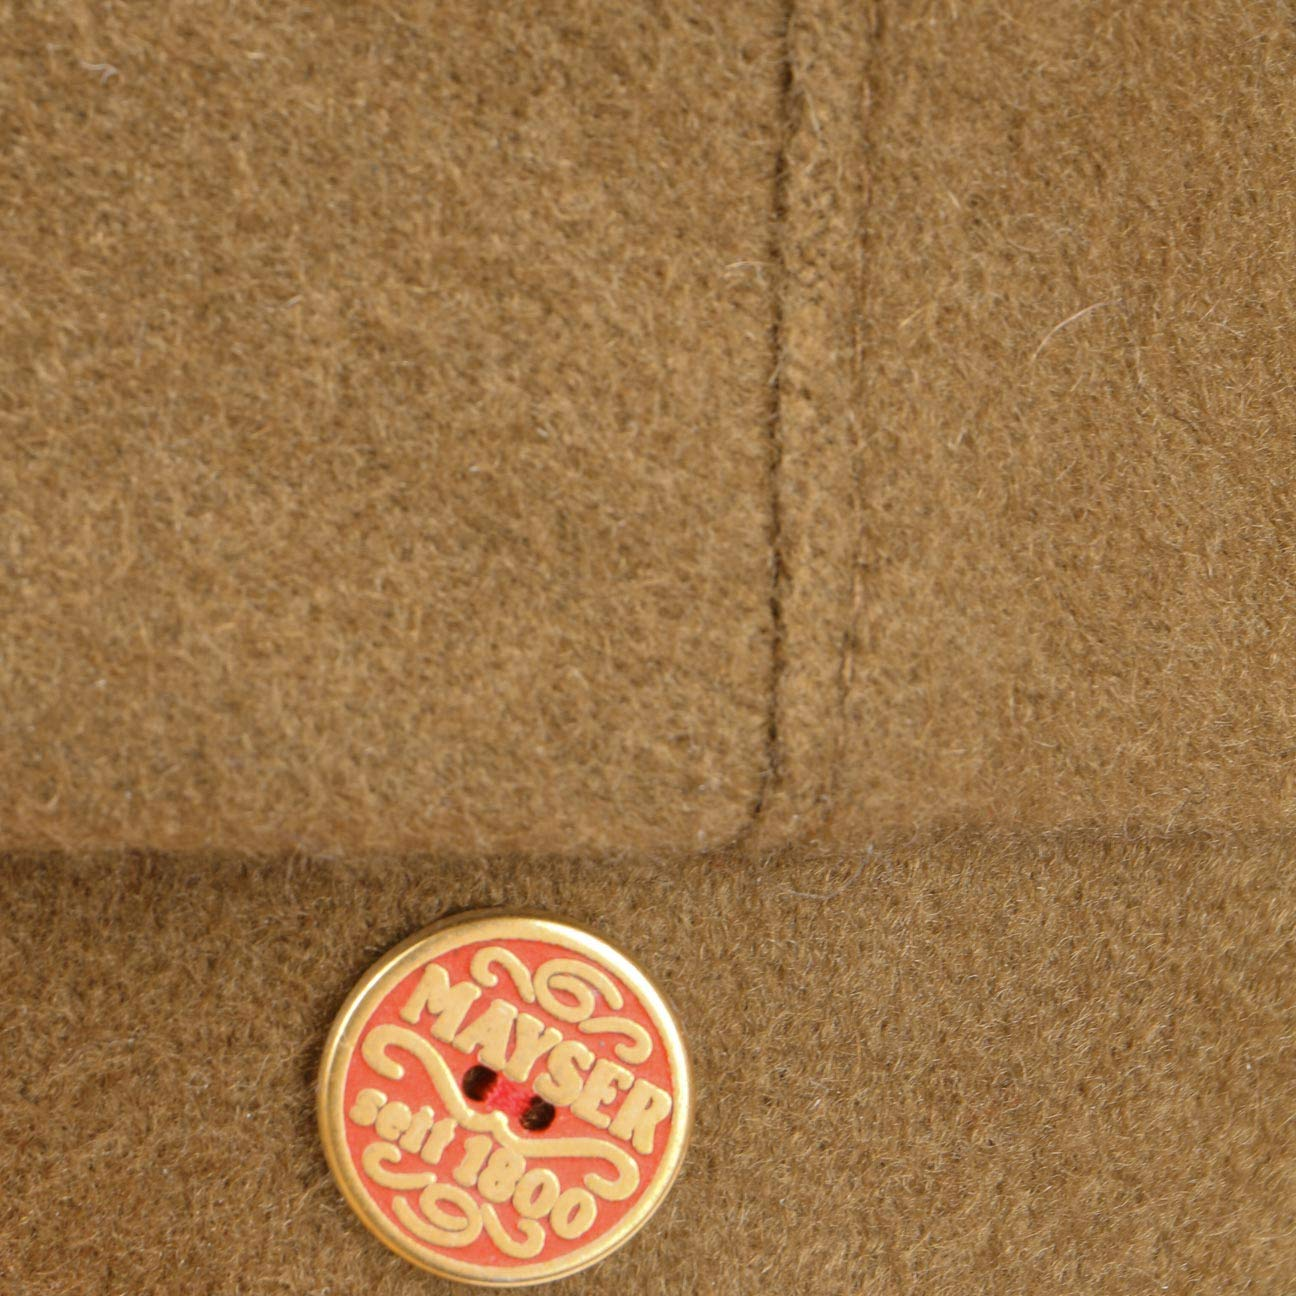 Mayser Frankie Cashmere Flat Cap Women/Men Camel 7 1/4 by Mayser (Image #4)